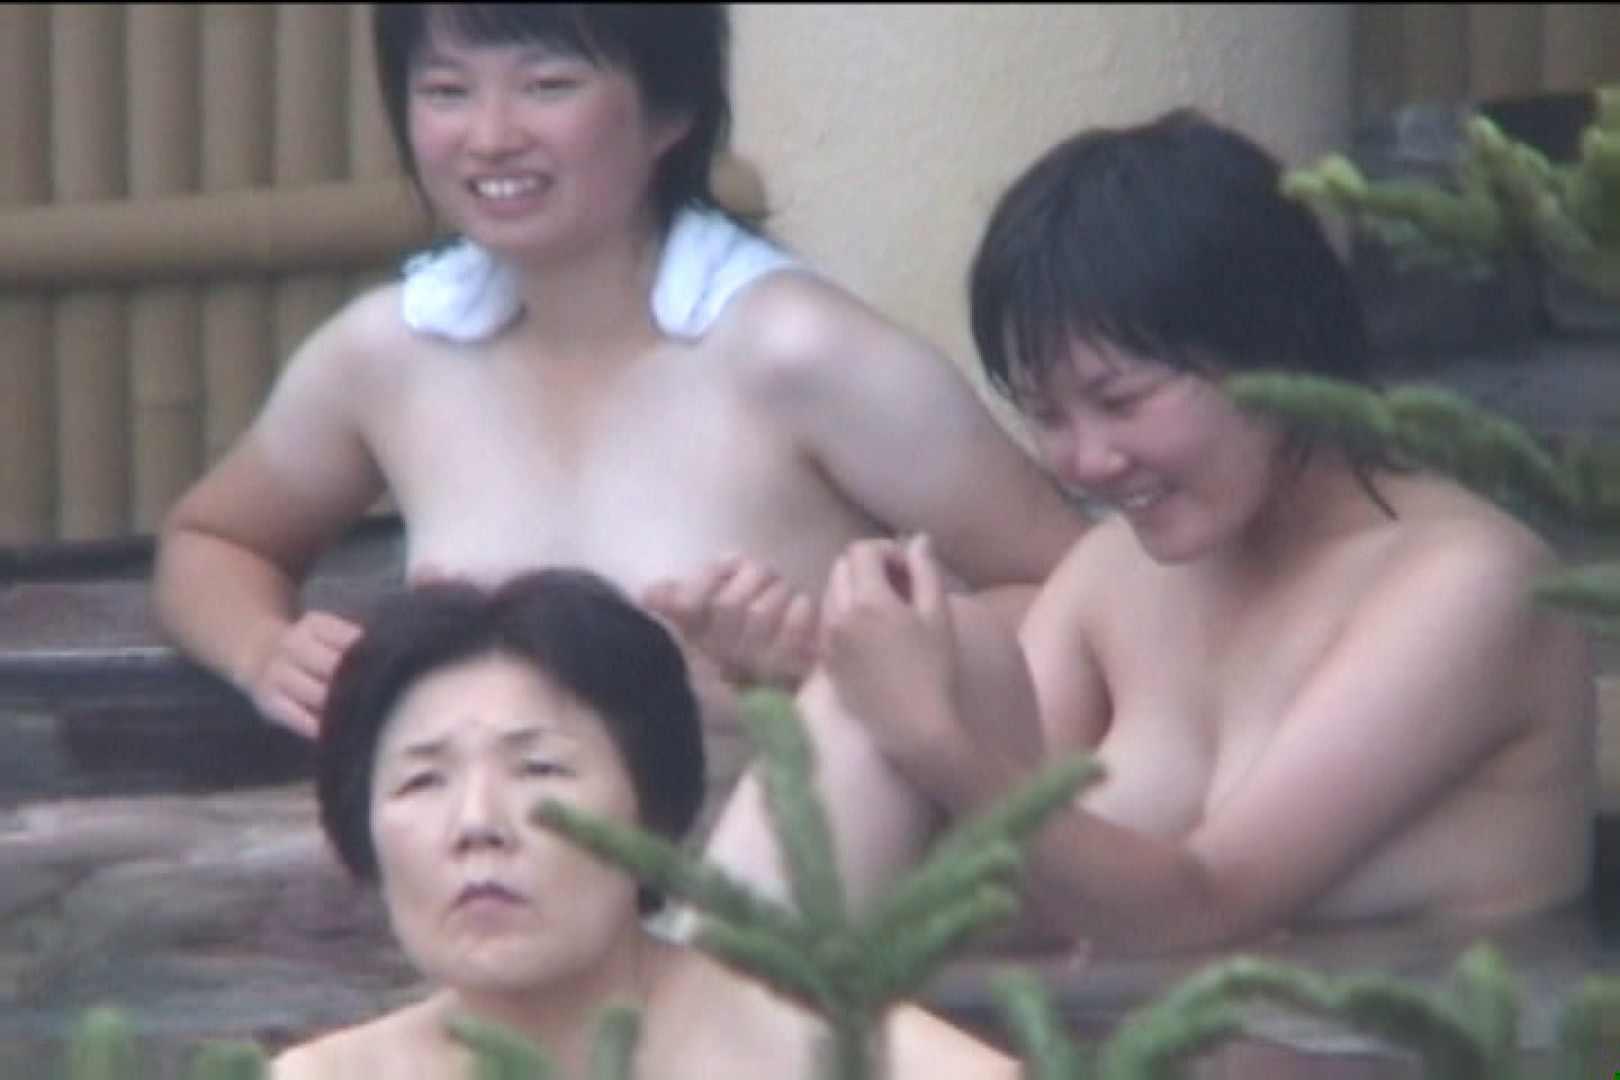 Aquaな露天風呂Vol.99【VIP限定】 OL女体  59連発 27